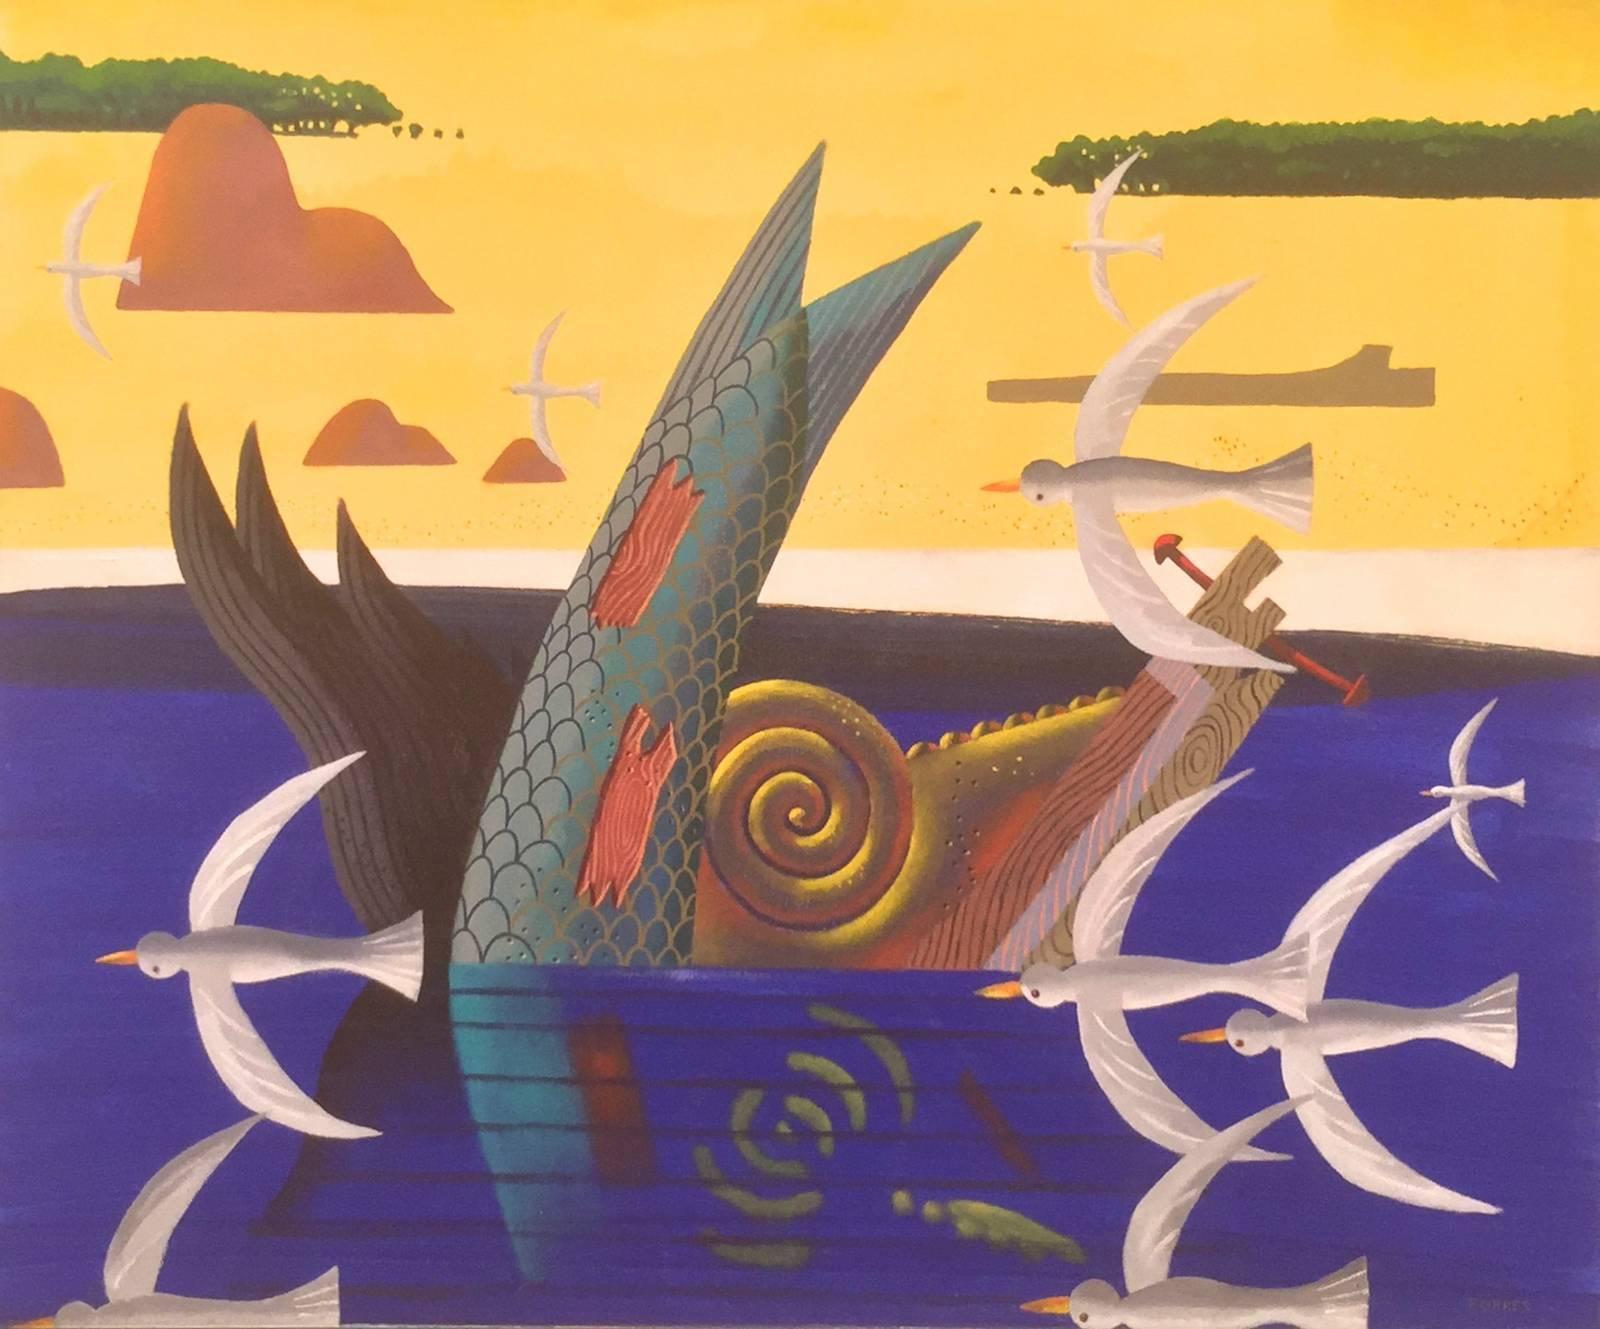 Figurehead Afloat Off 90 Mile Beach, Rodney Forbes oil painting, ocean Australia